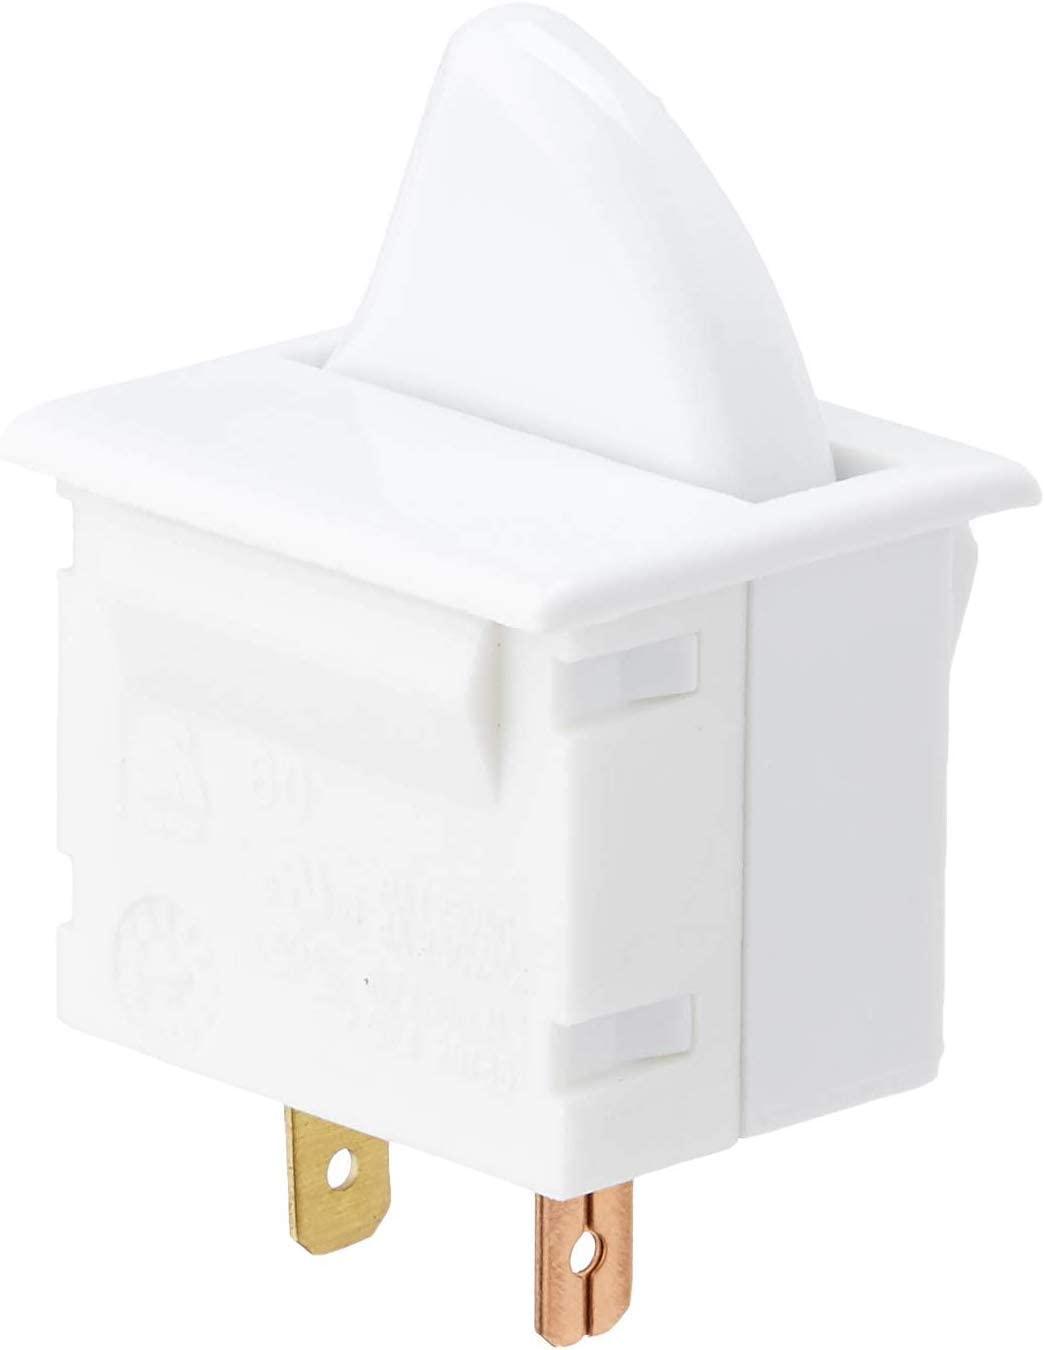 WP12466115SP Refrigerator Light Switch 12466111SP 12466115SP for Whirlpool Genuine OEM